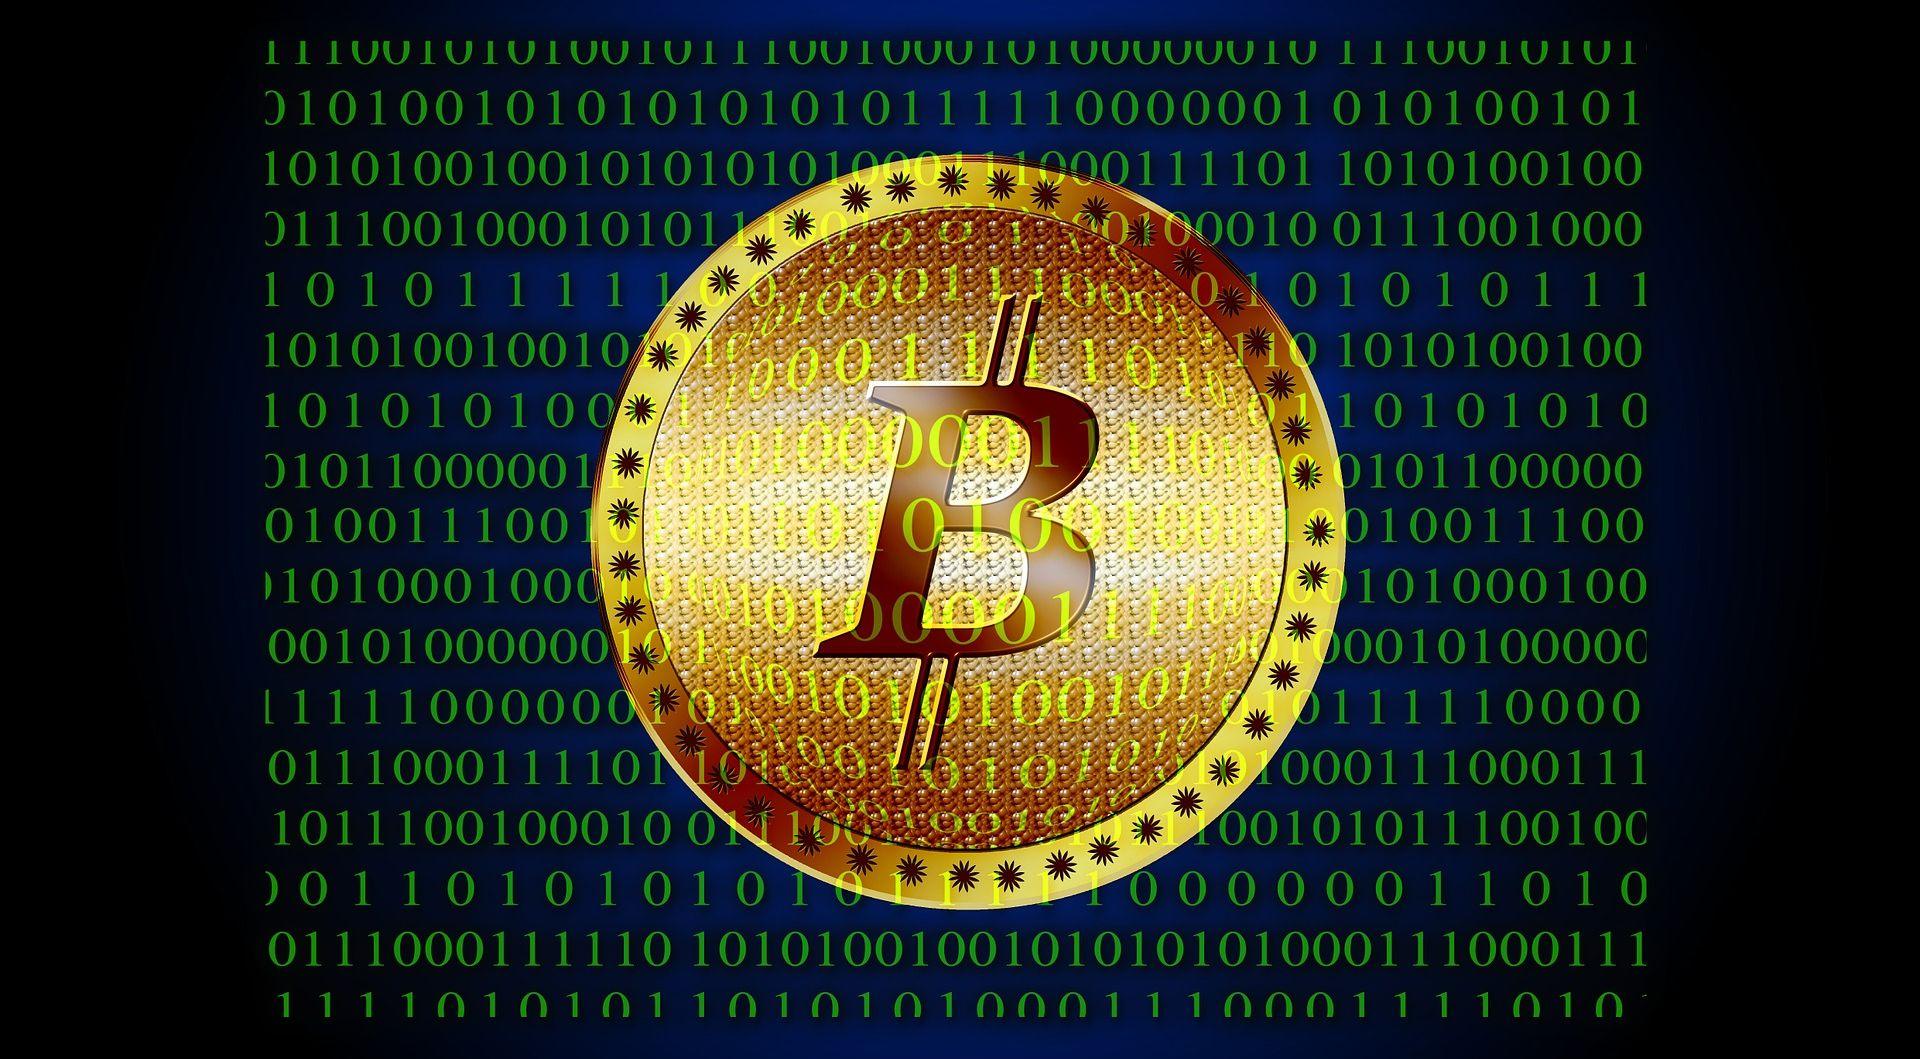 56 MILIJARDI $ Bitcoin na novoj rekordnoj razini iznad 3.400 dolara